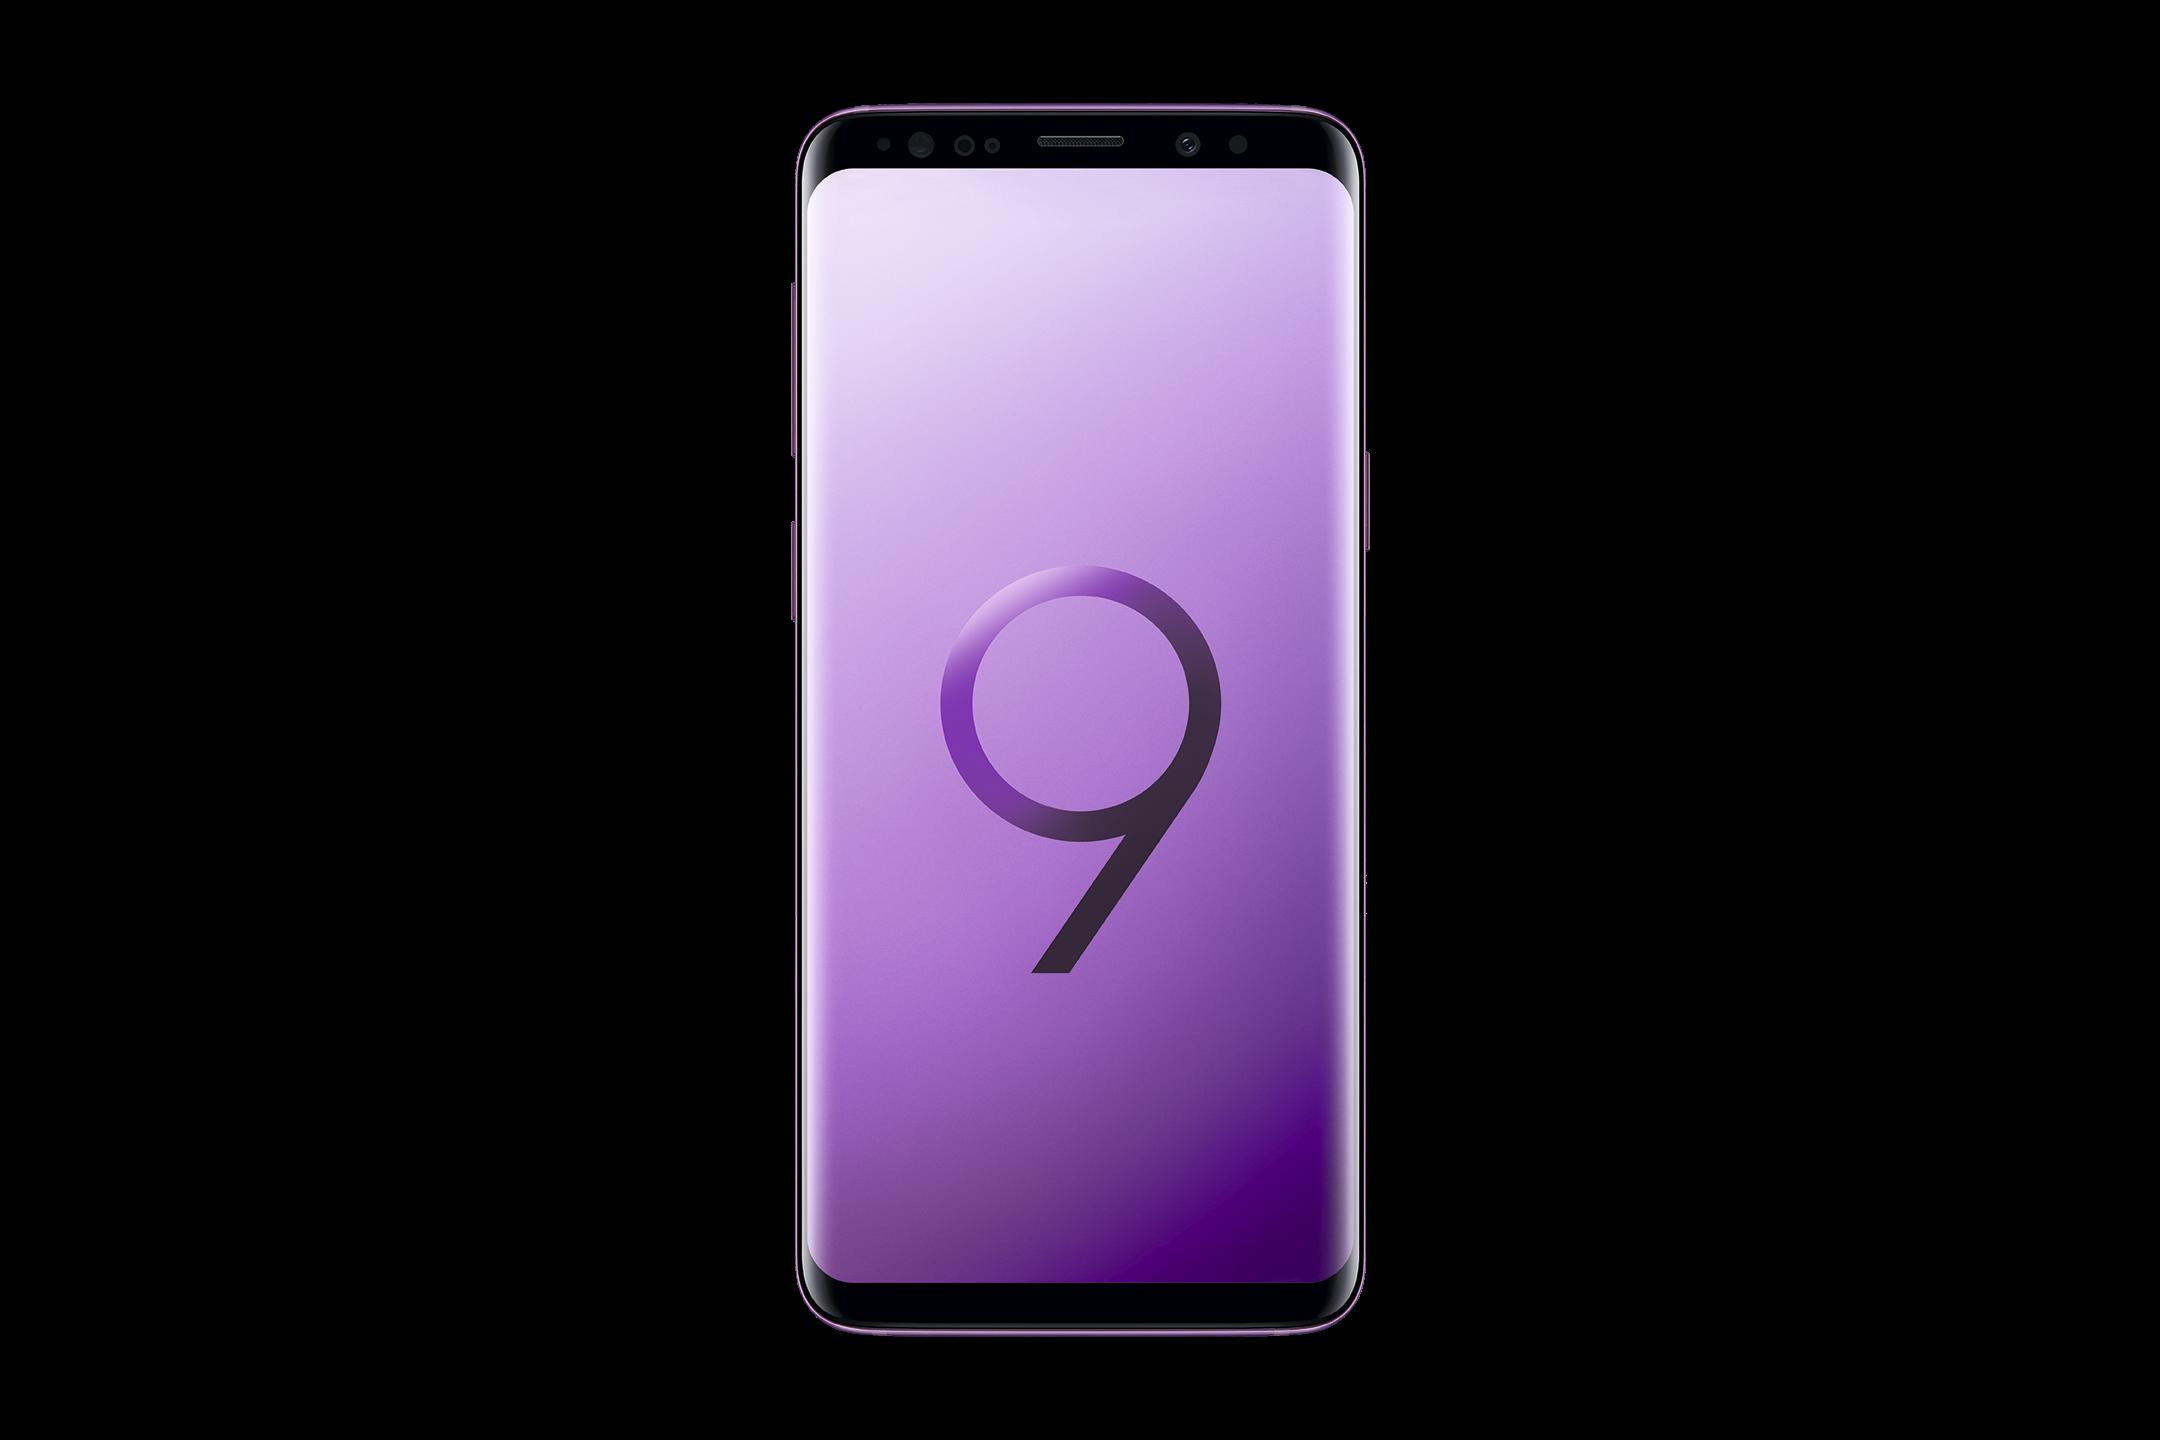 6_Samsung Galaxy S9 in Pink